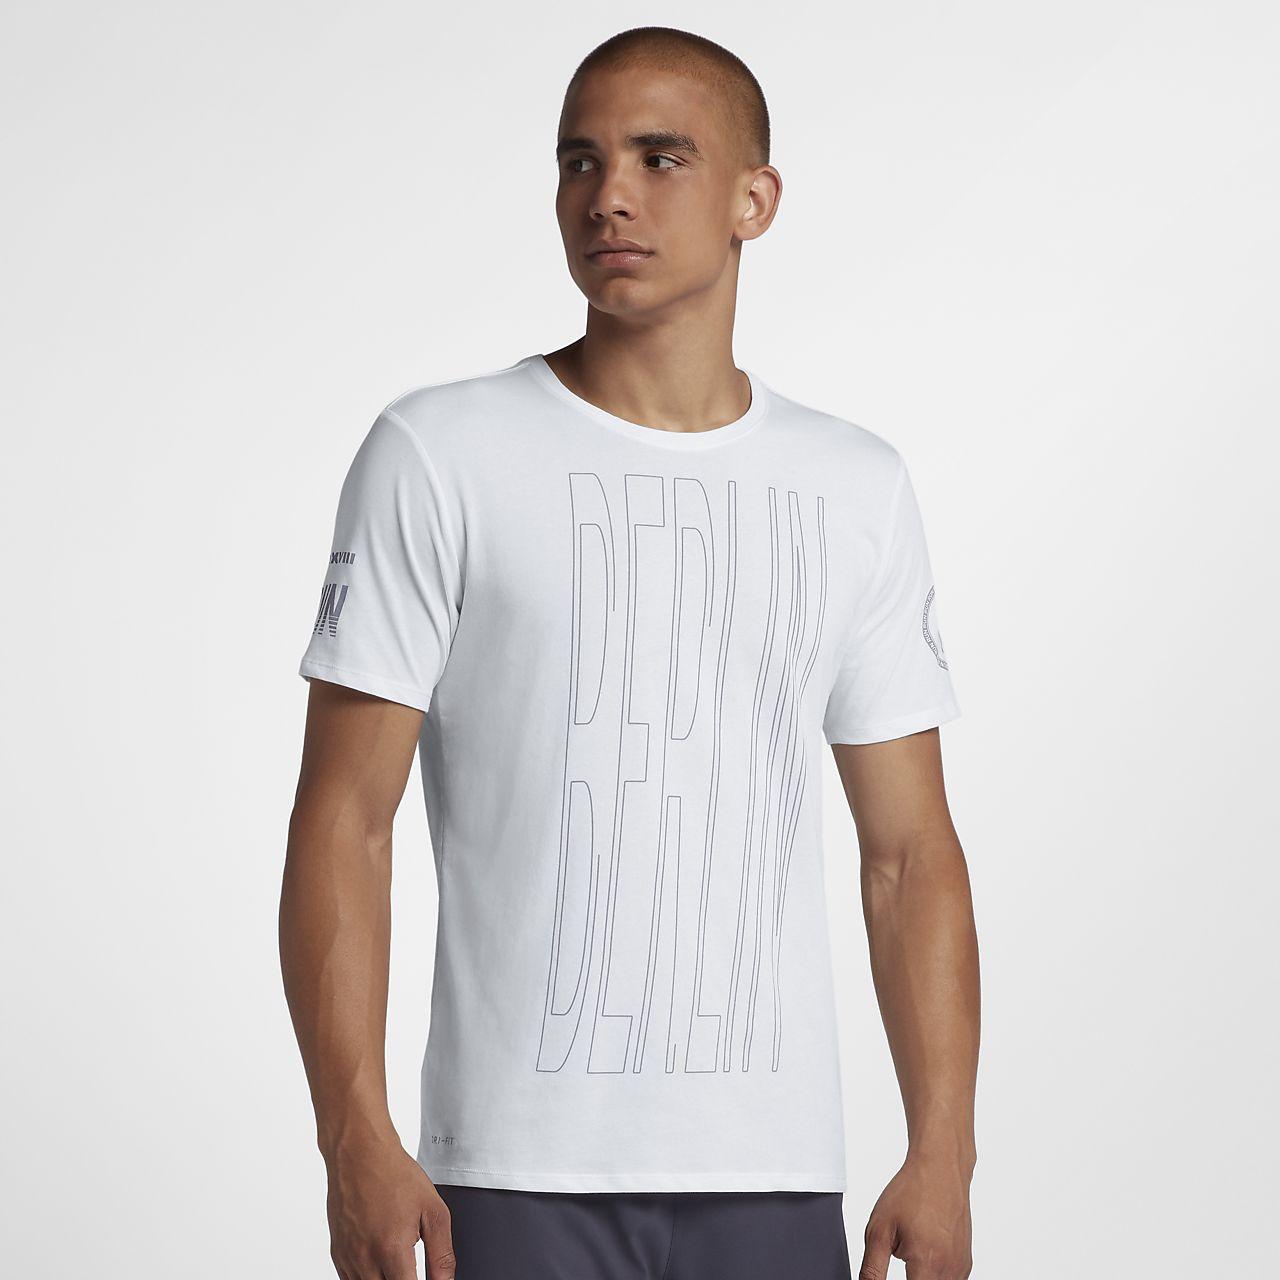 Nike Dri-FIT (Berlin 2018) Herren-Laufshirt